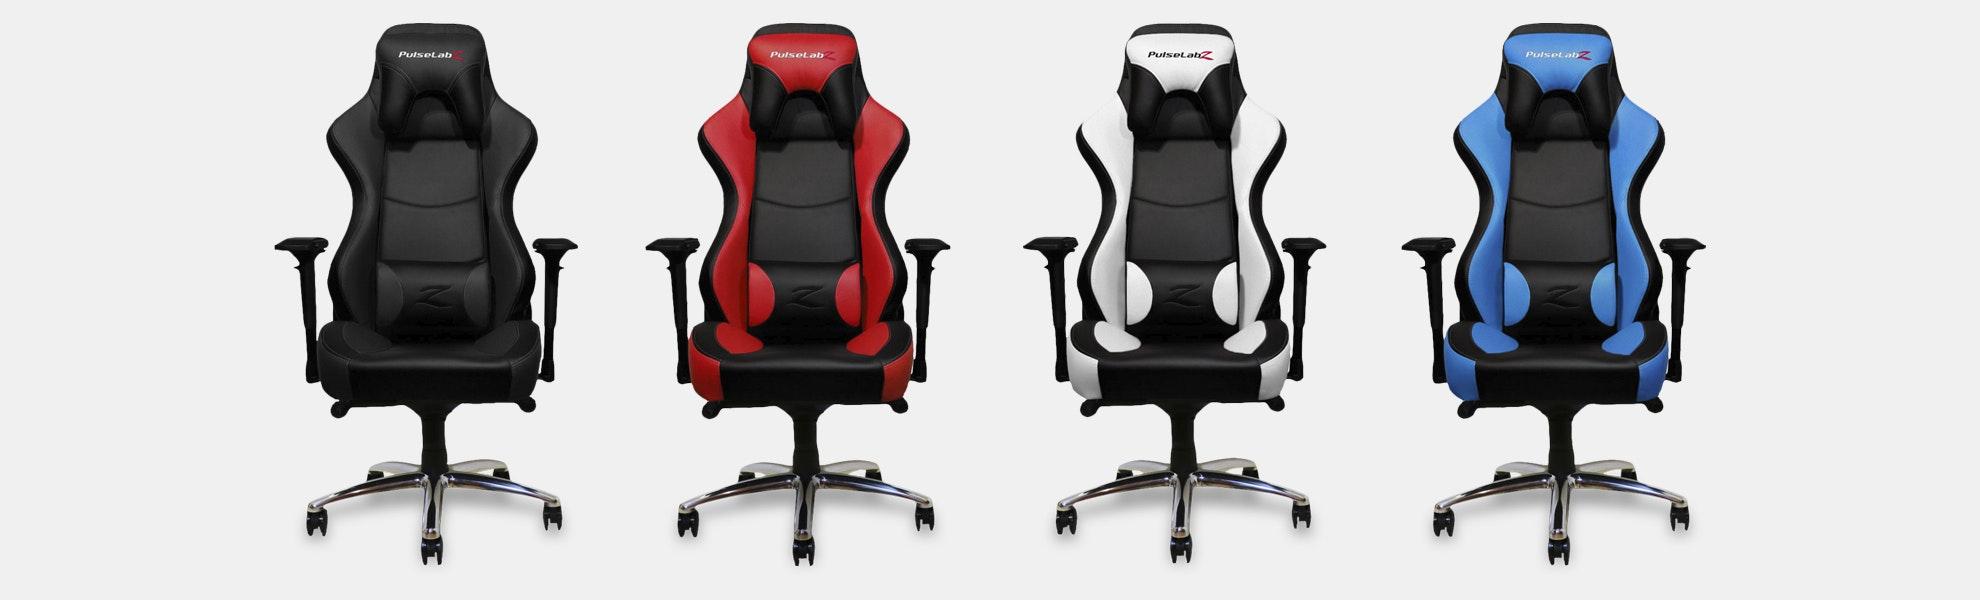 Pulselabz Guardian Series Signature Gaming Chair